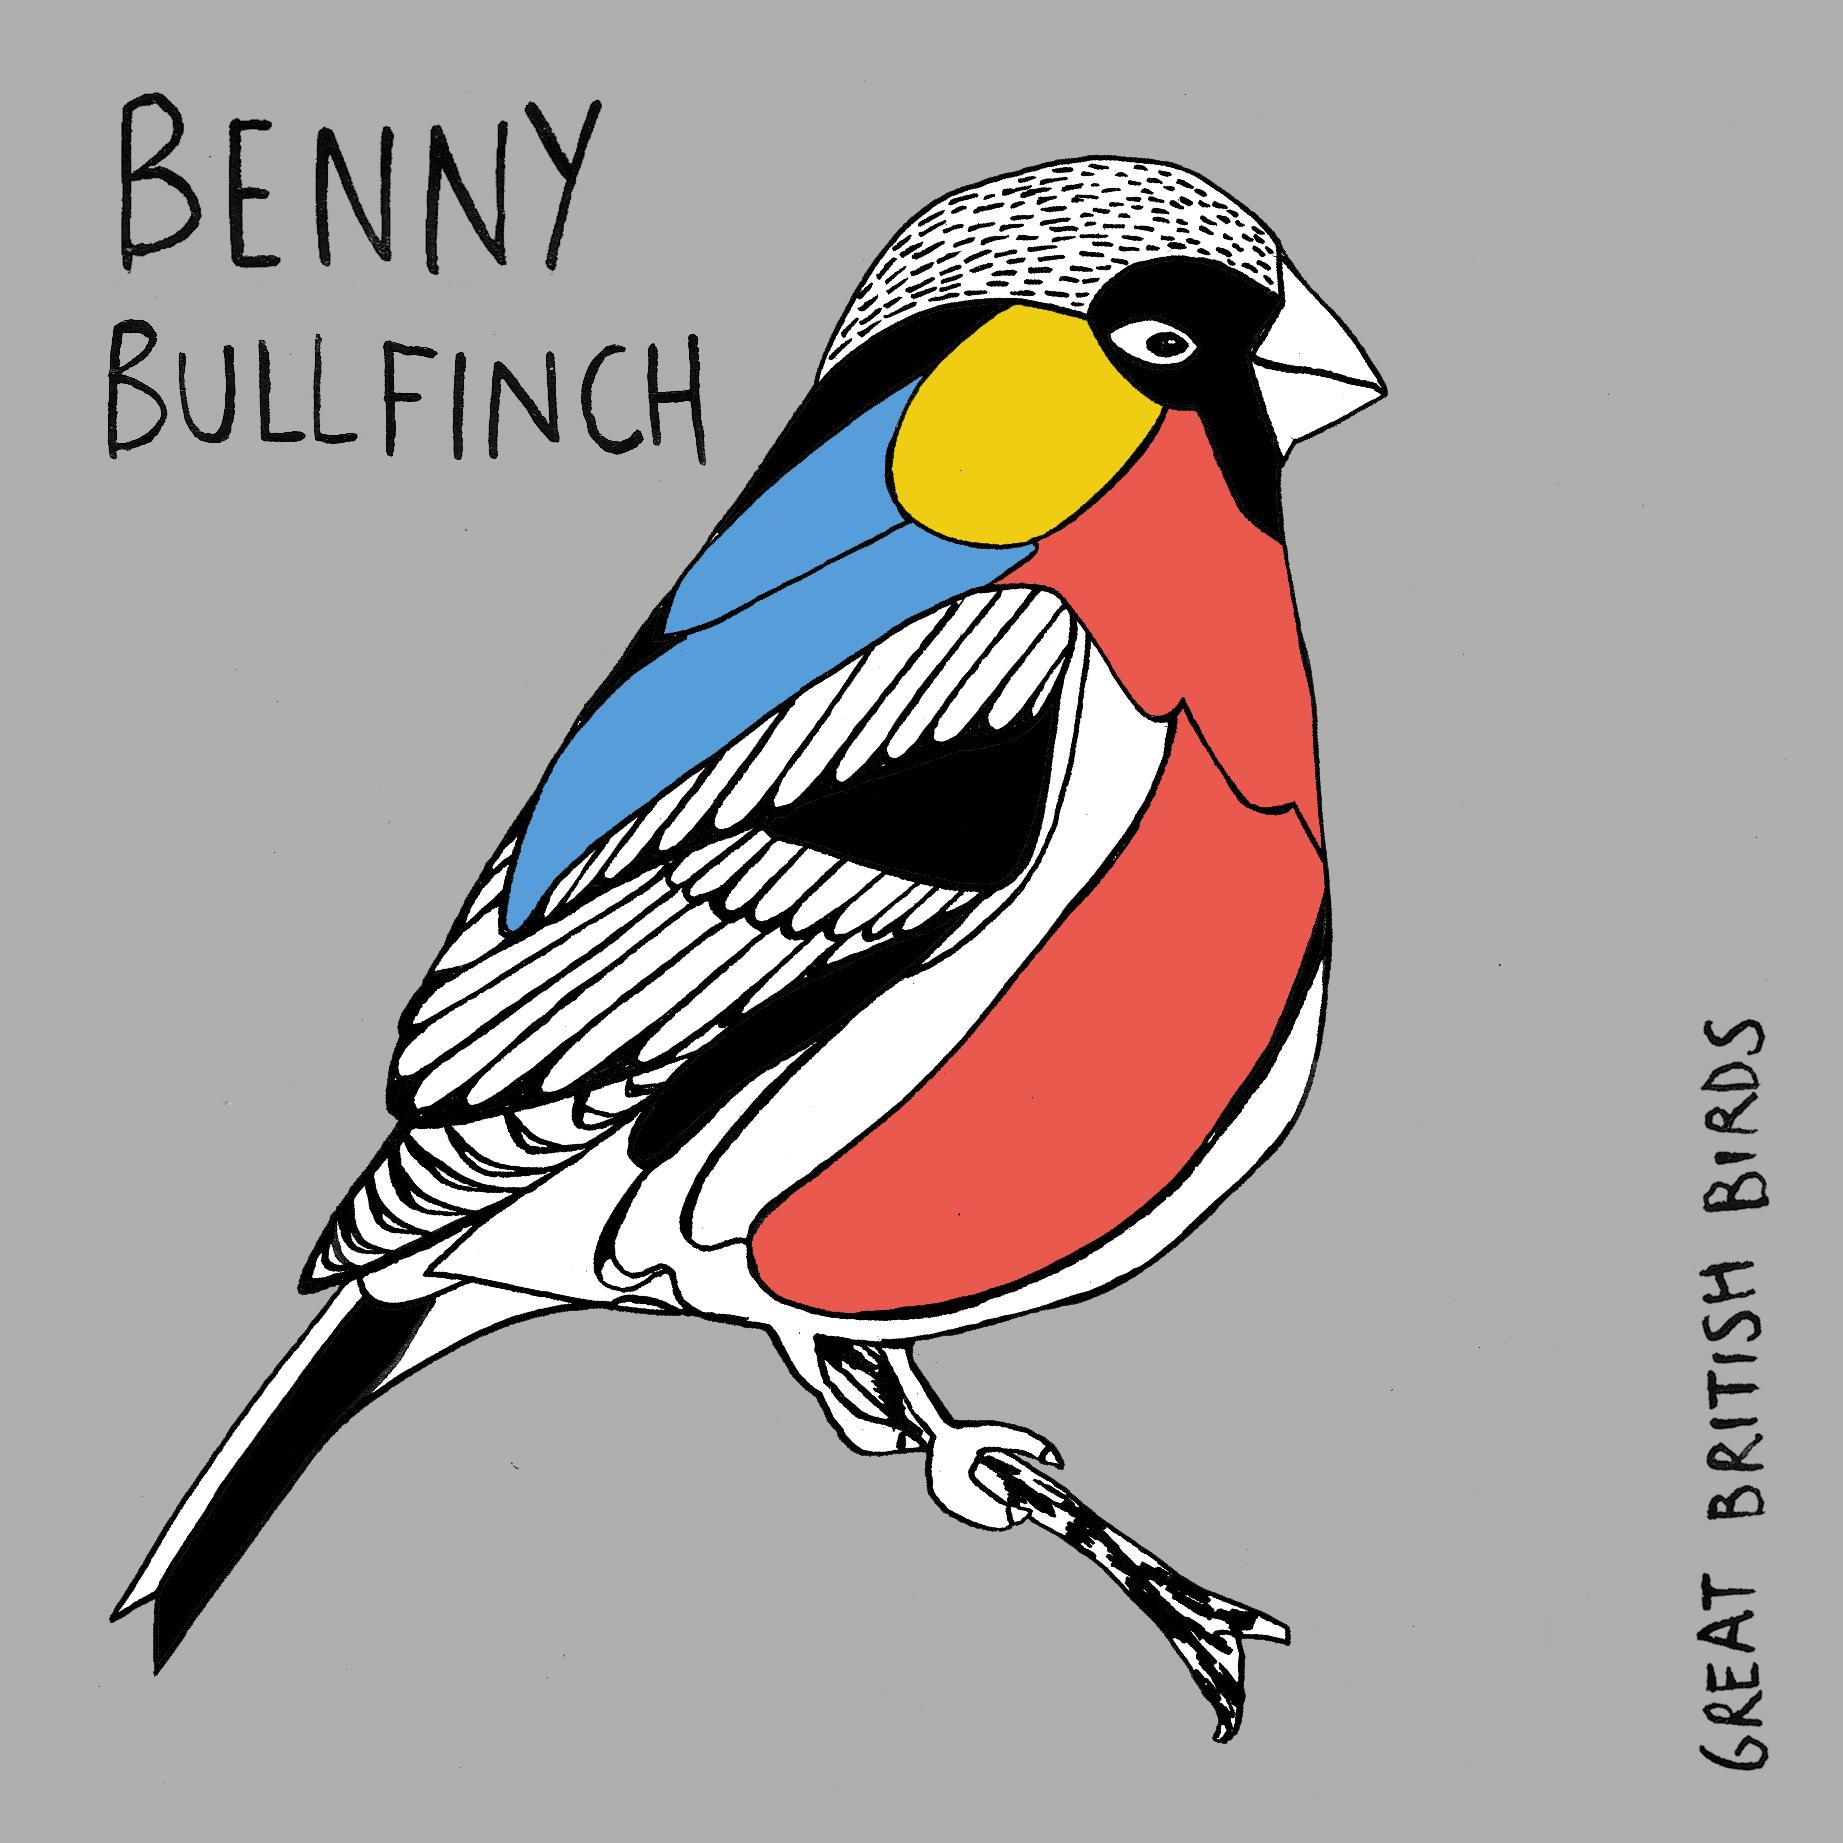 BIRDS_Benny_Bullfinch_Card.jpg